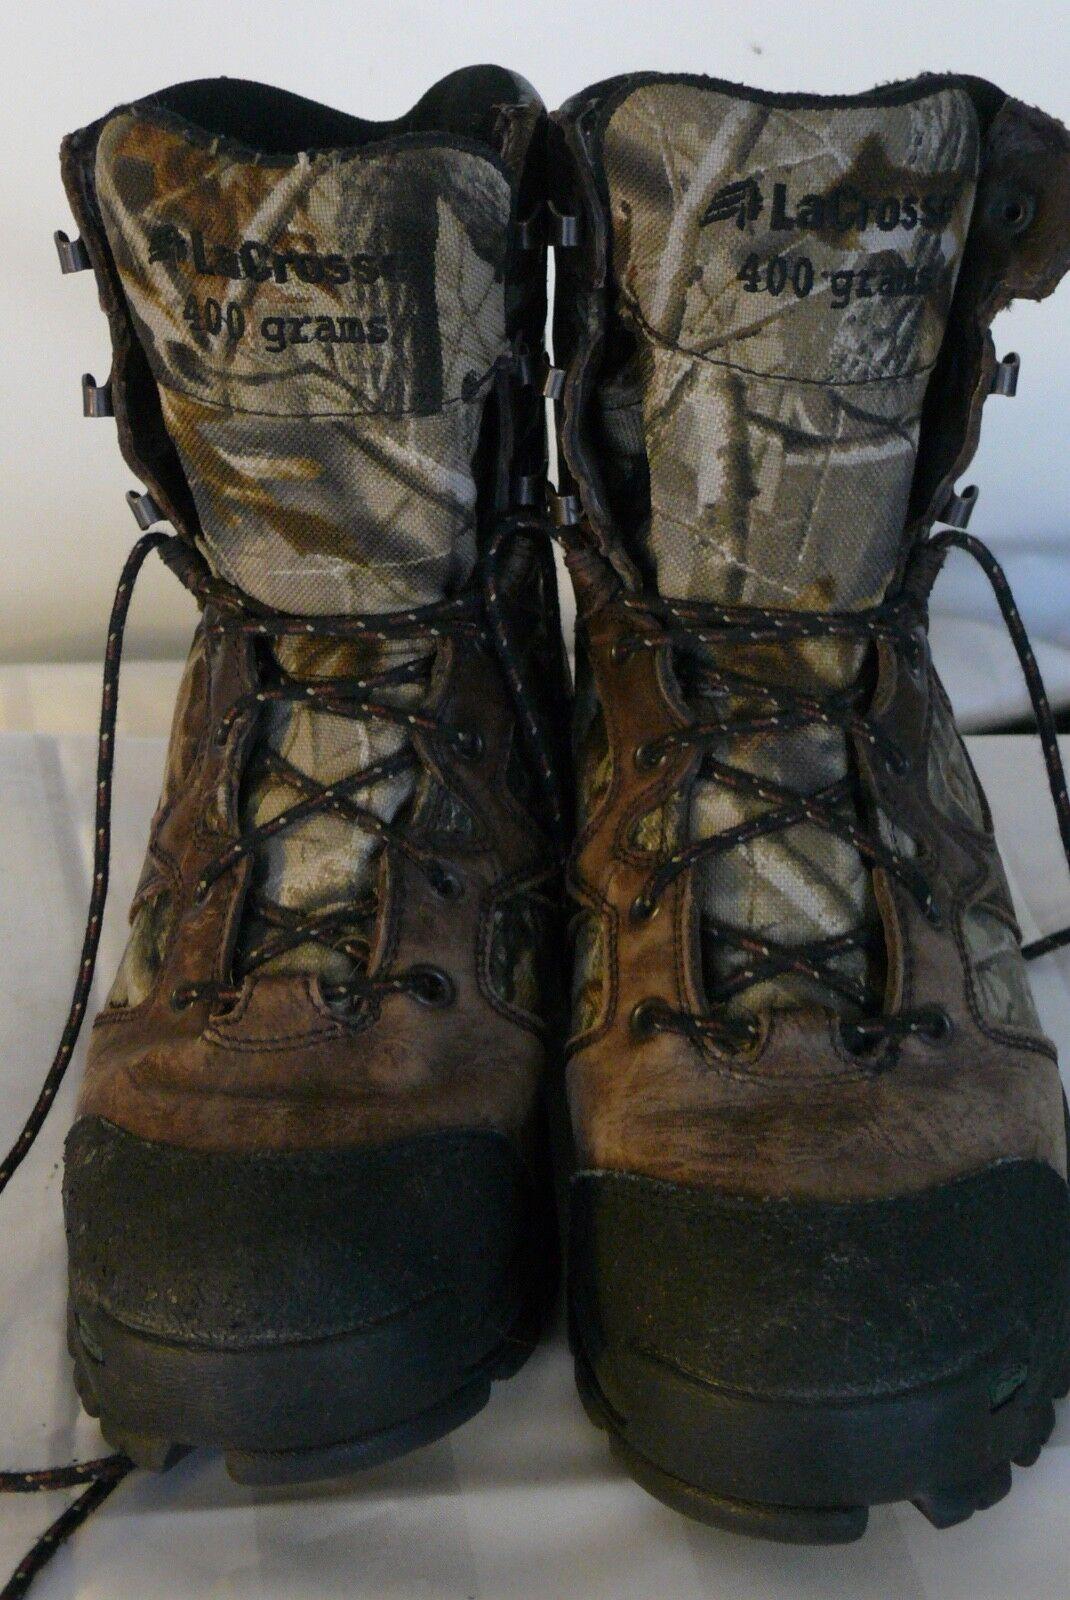 Lacrosse 400 Hunting Insulated Gortex Stivali Uomo Size 7 Road Trip